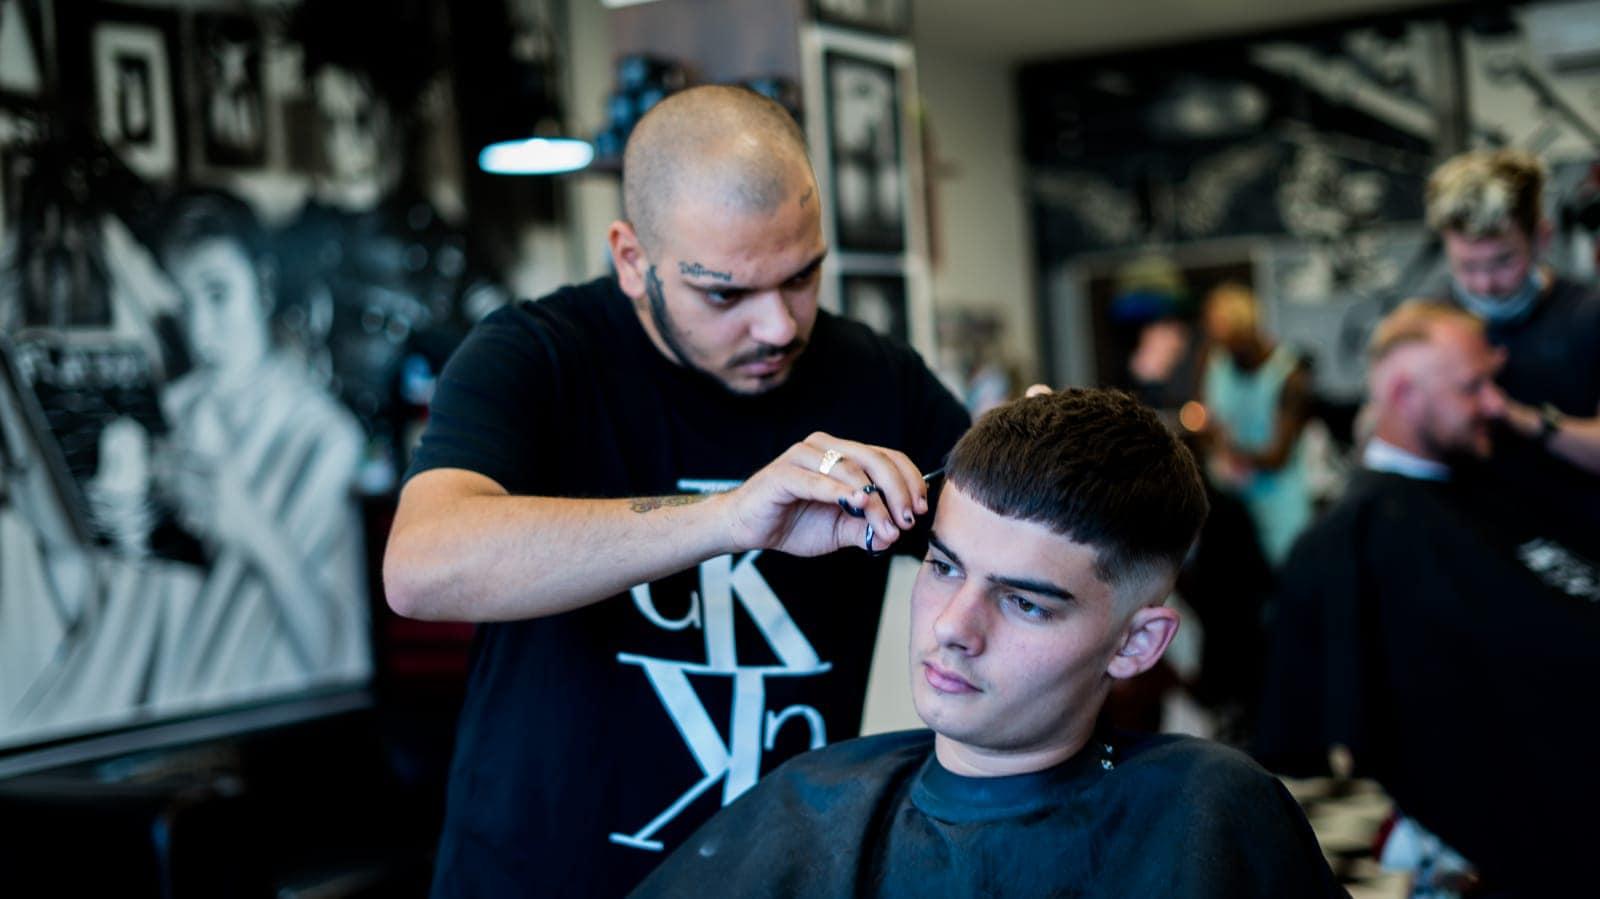 Roman stříhá zákazníka